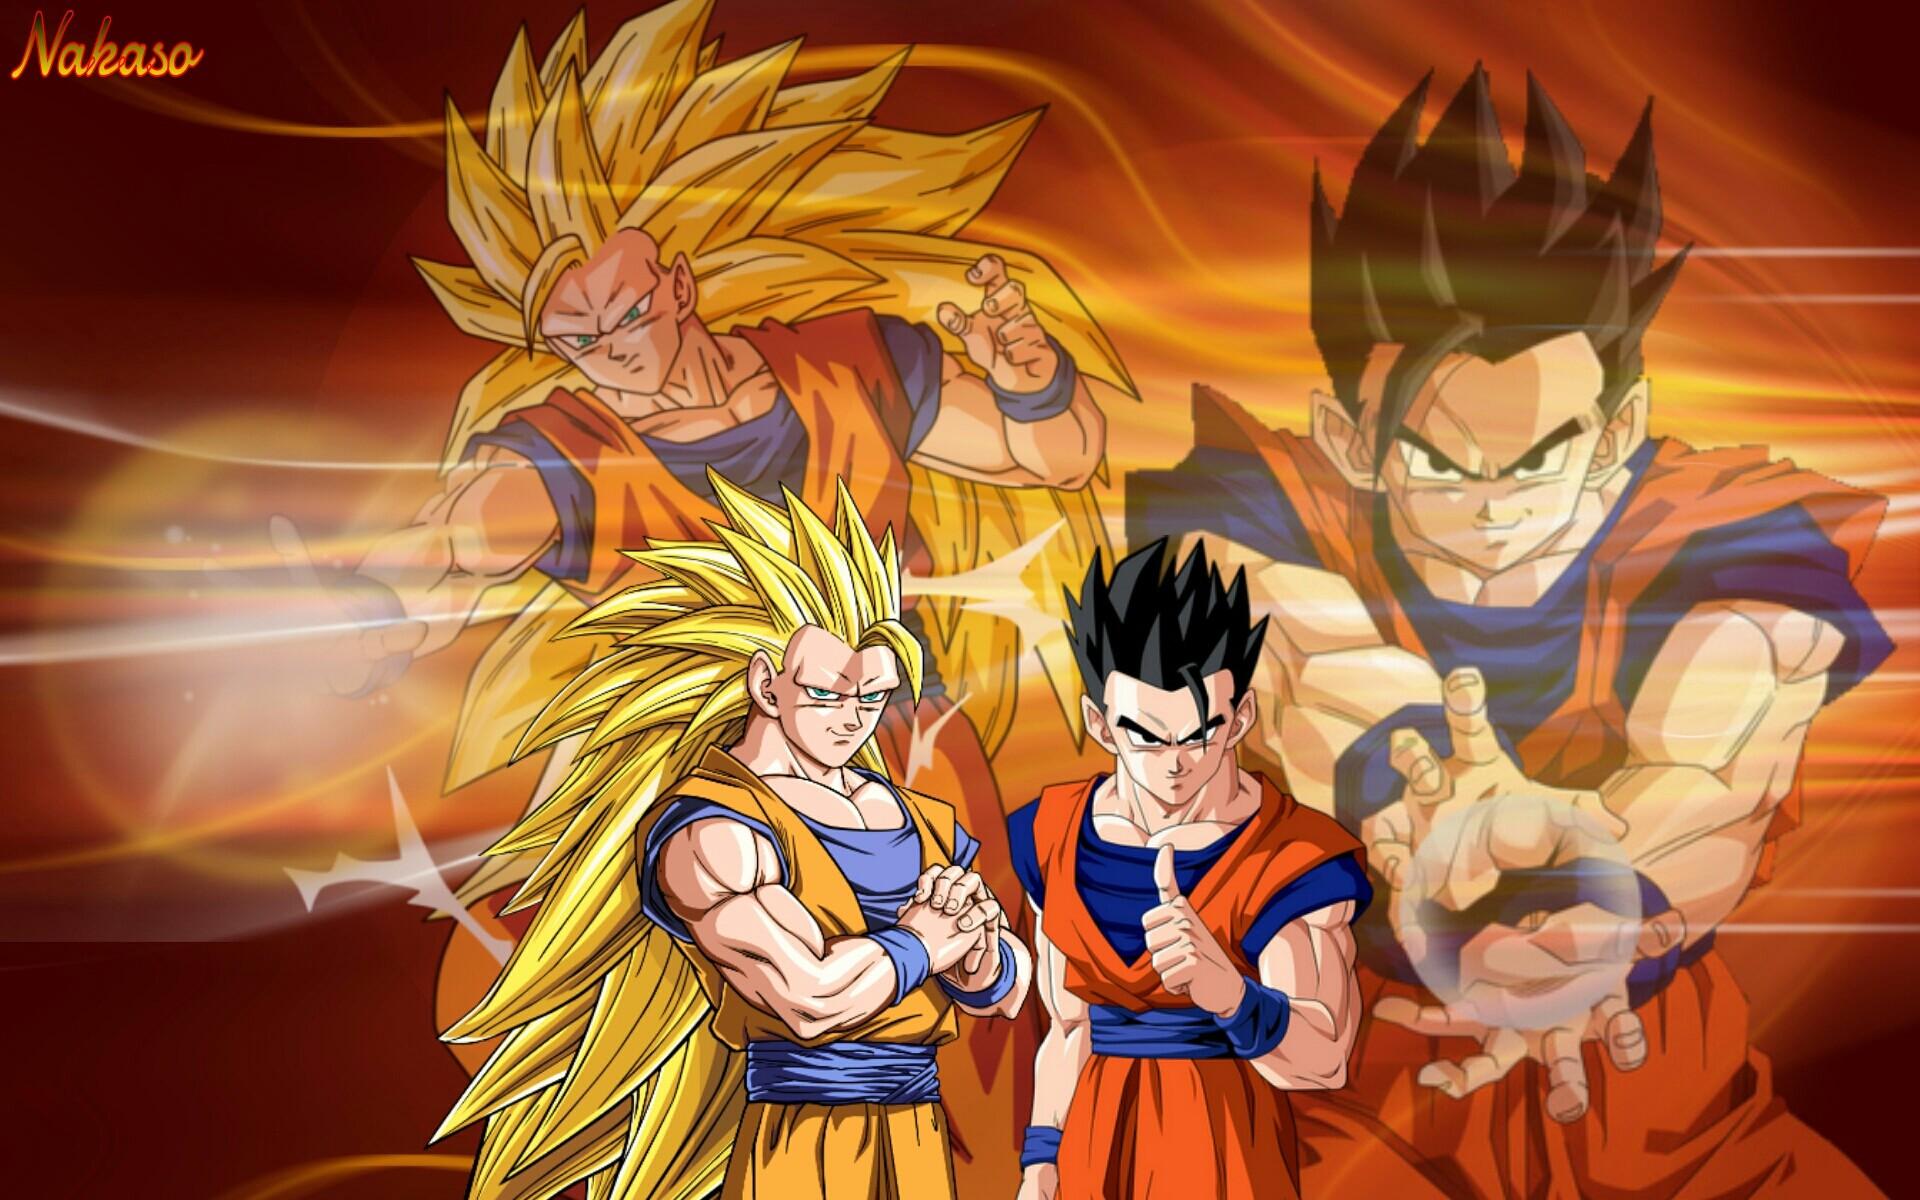 Res: 1920x1200, DBZ Goku SSJ3 and Ultimate Gohan by Nakaso on DeviantArt